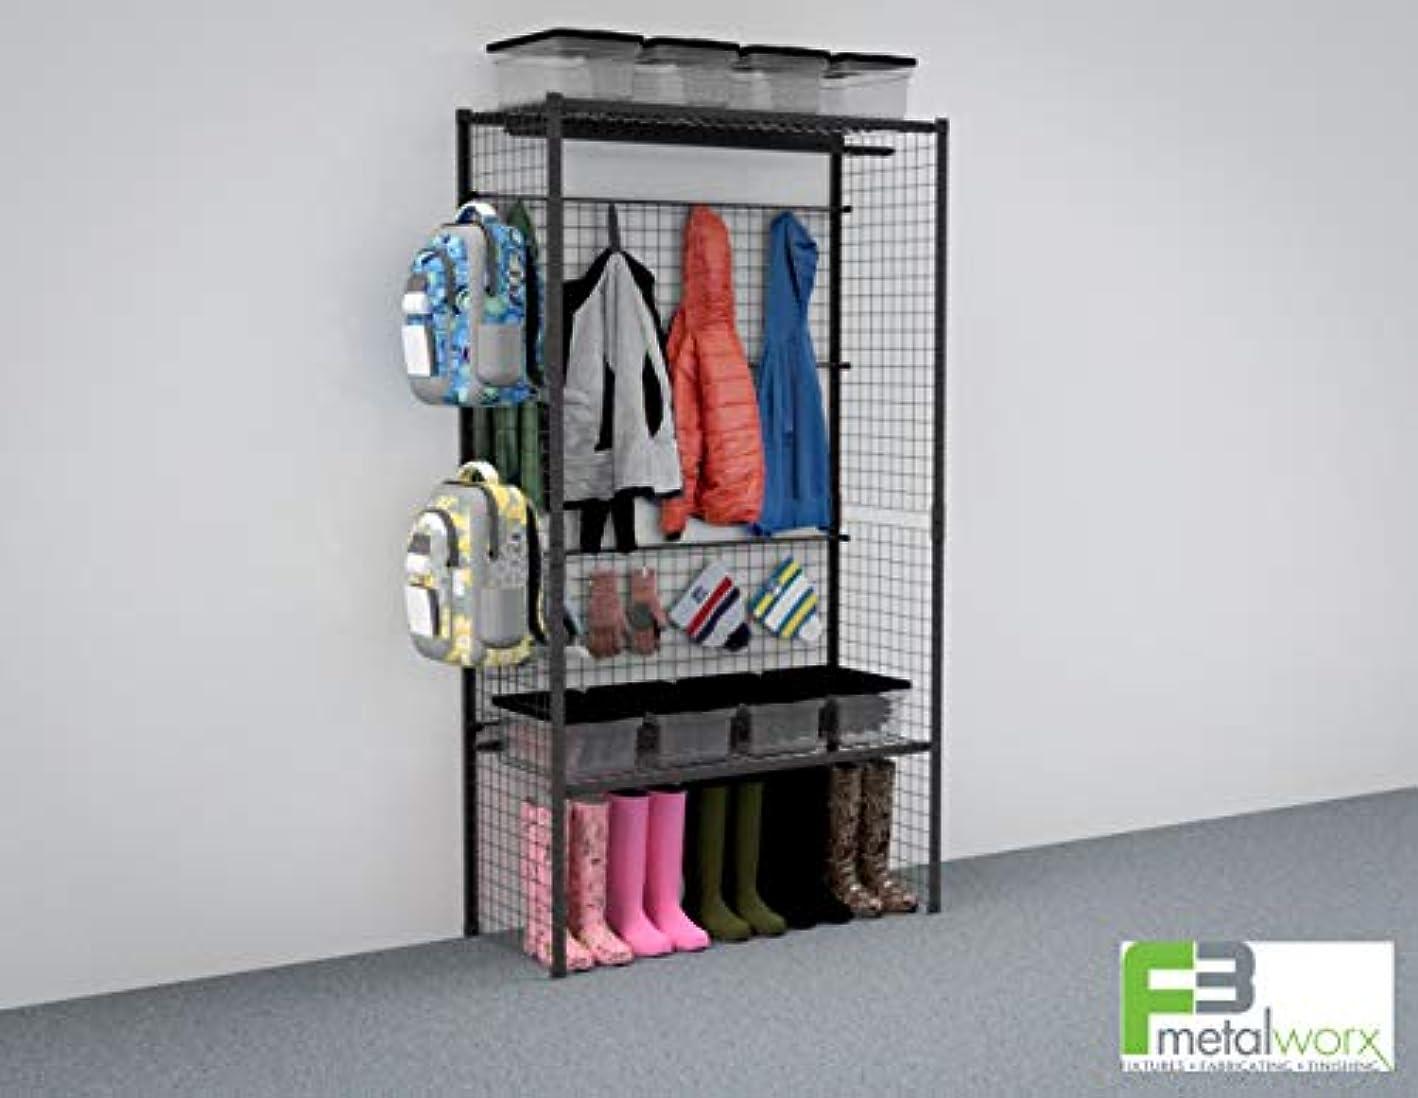 Flexworx Apparel Package, Garage storage, Mudroom shelving, Home organization